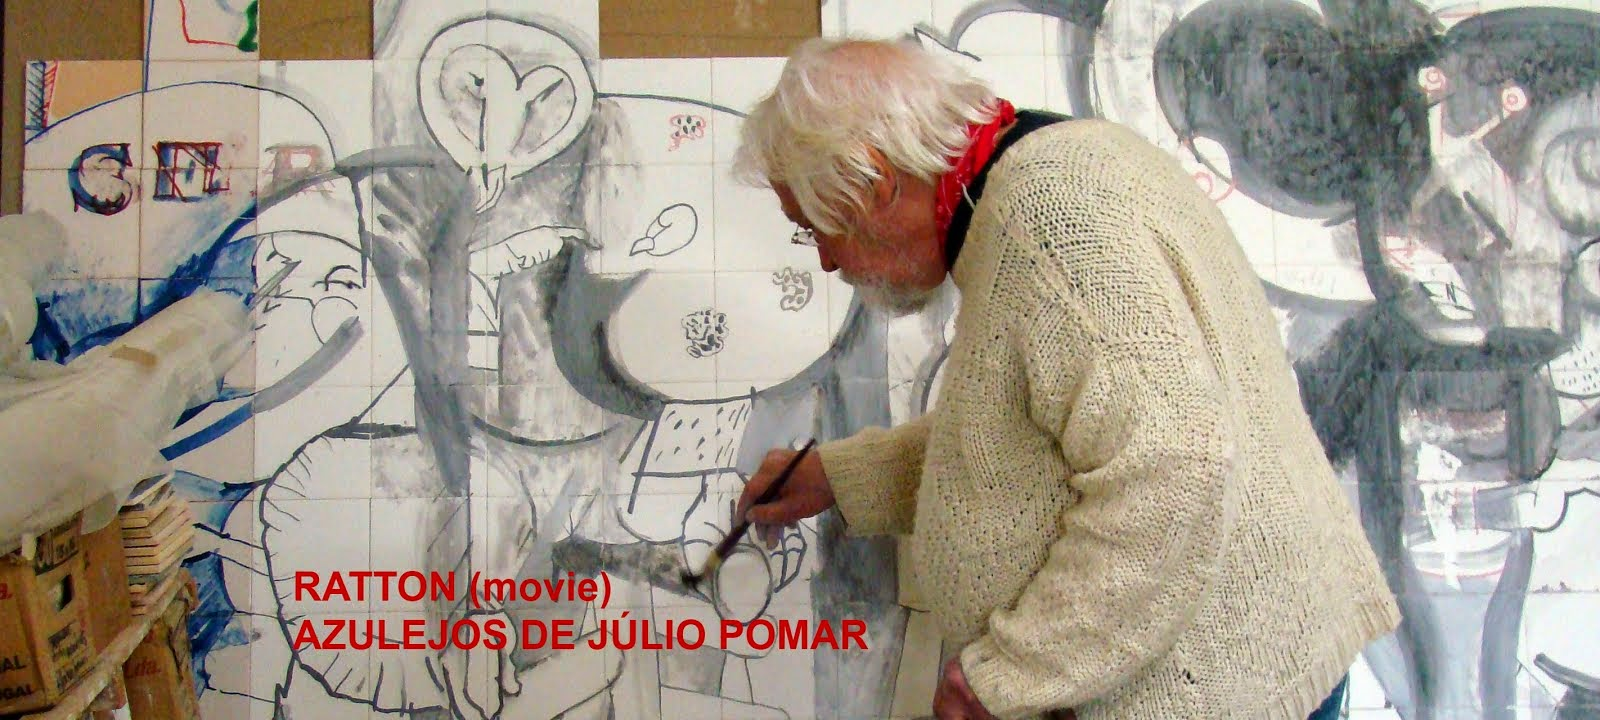 JÚLIO POMAR (1926-2018)